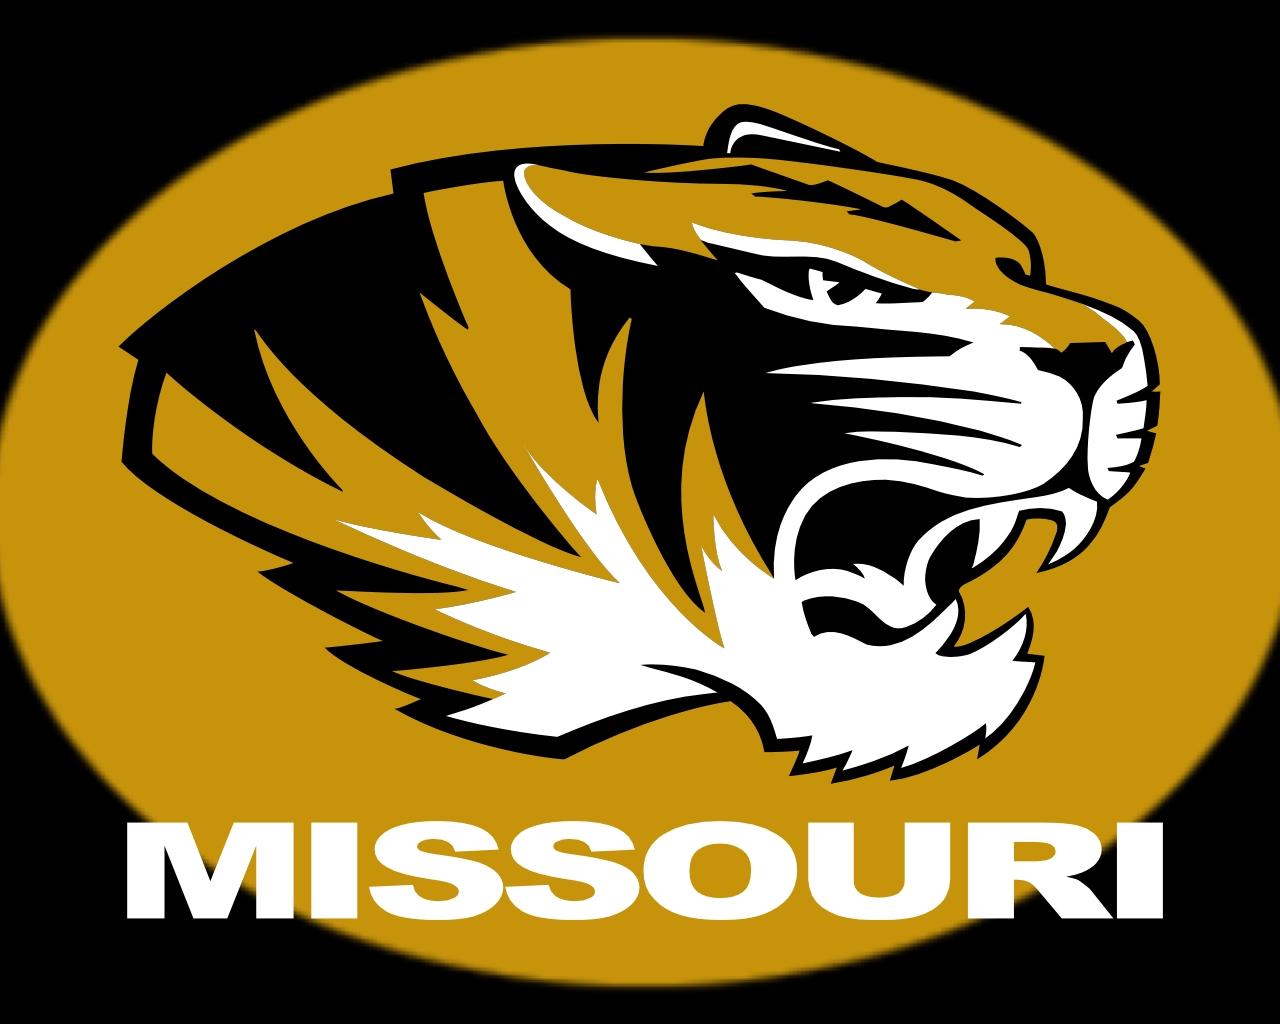 Free Download Missouri Tigers 1365x1024 For Your Desktop Mobile Tablet Explore 50 Missouri Tigers Wallpaper University Of Missouri Wallpaper Mizzou Wallpaper For Desktop Wallpapers Missouri Tigers Logo